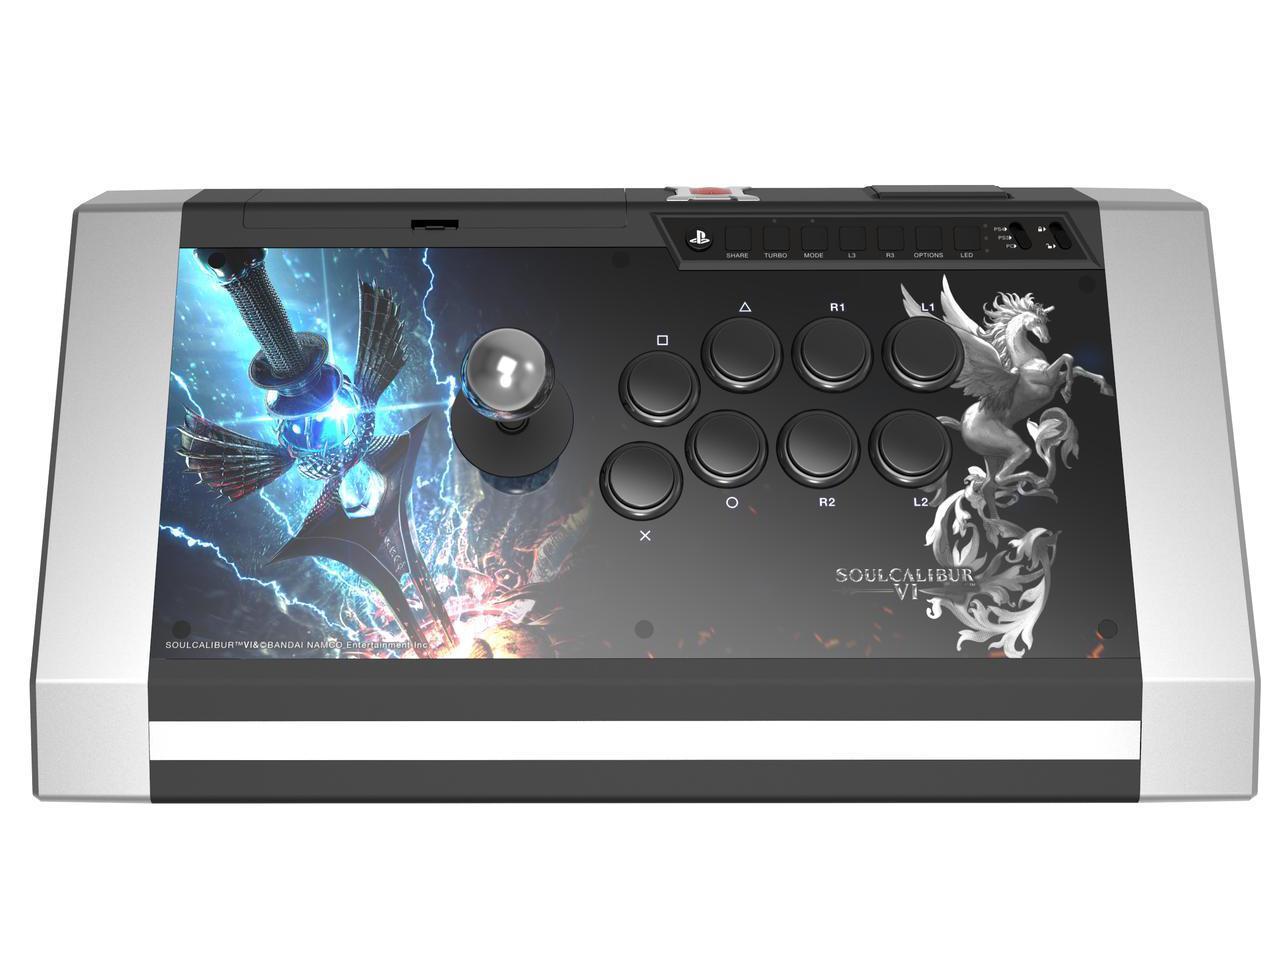 Qanba Obsidian Joystick (Tekken ed or SOULCALIBUR VI) for PlayStation 4 | 3 and PC $100 AC @Newegg